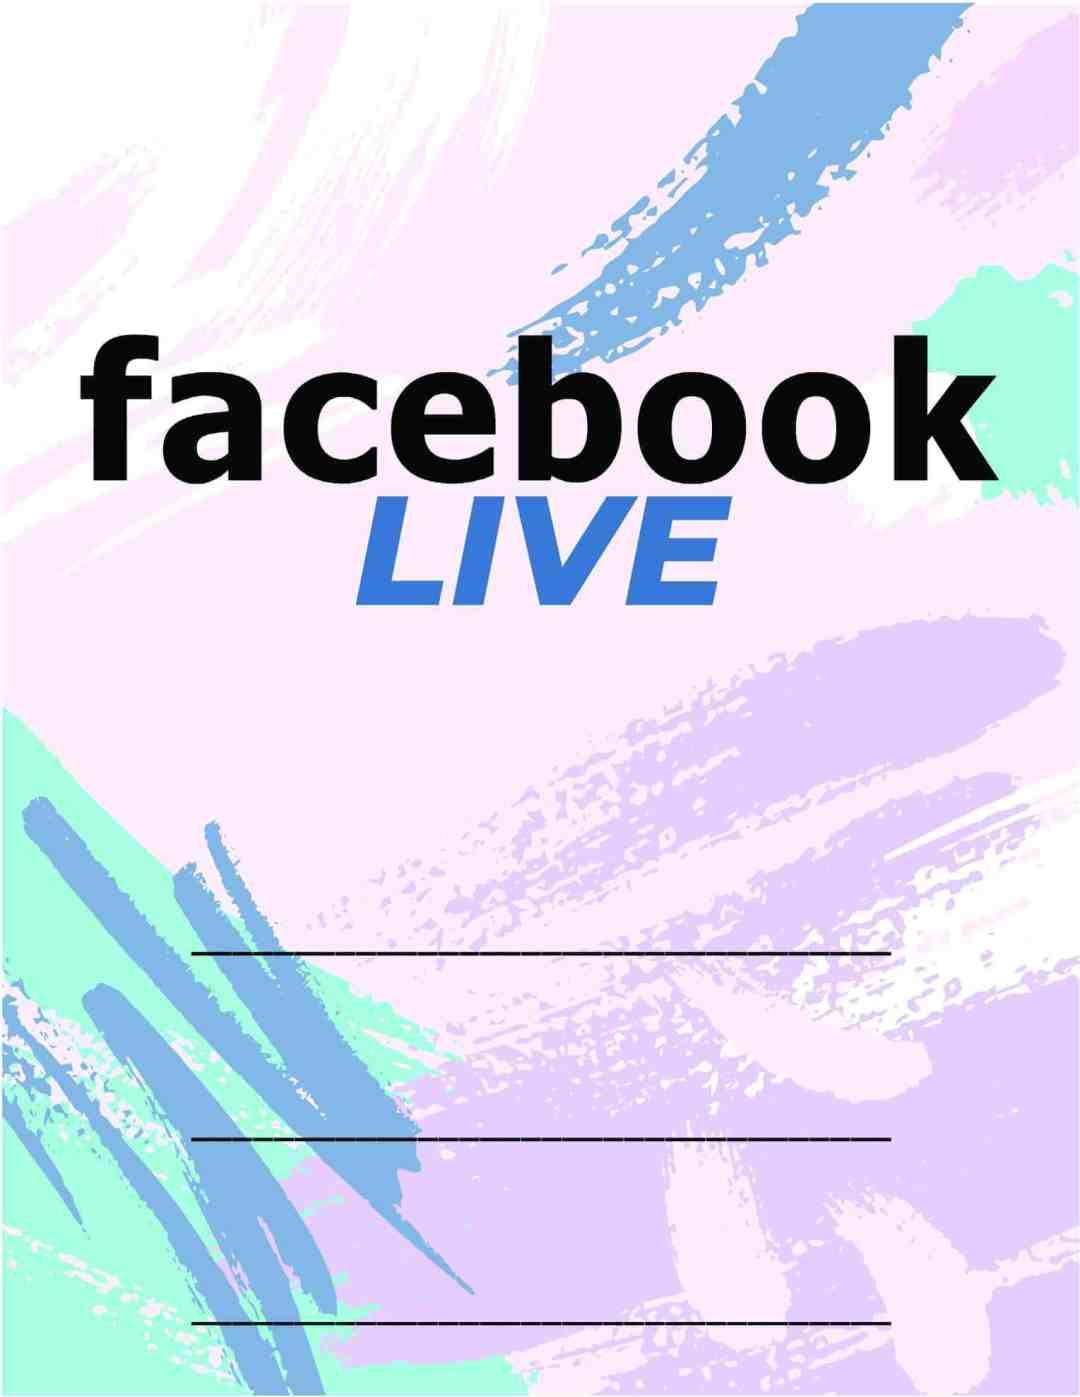 Facebook Live Invitations - Pastel Blue Purple - All Free Invitations